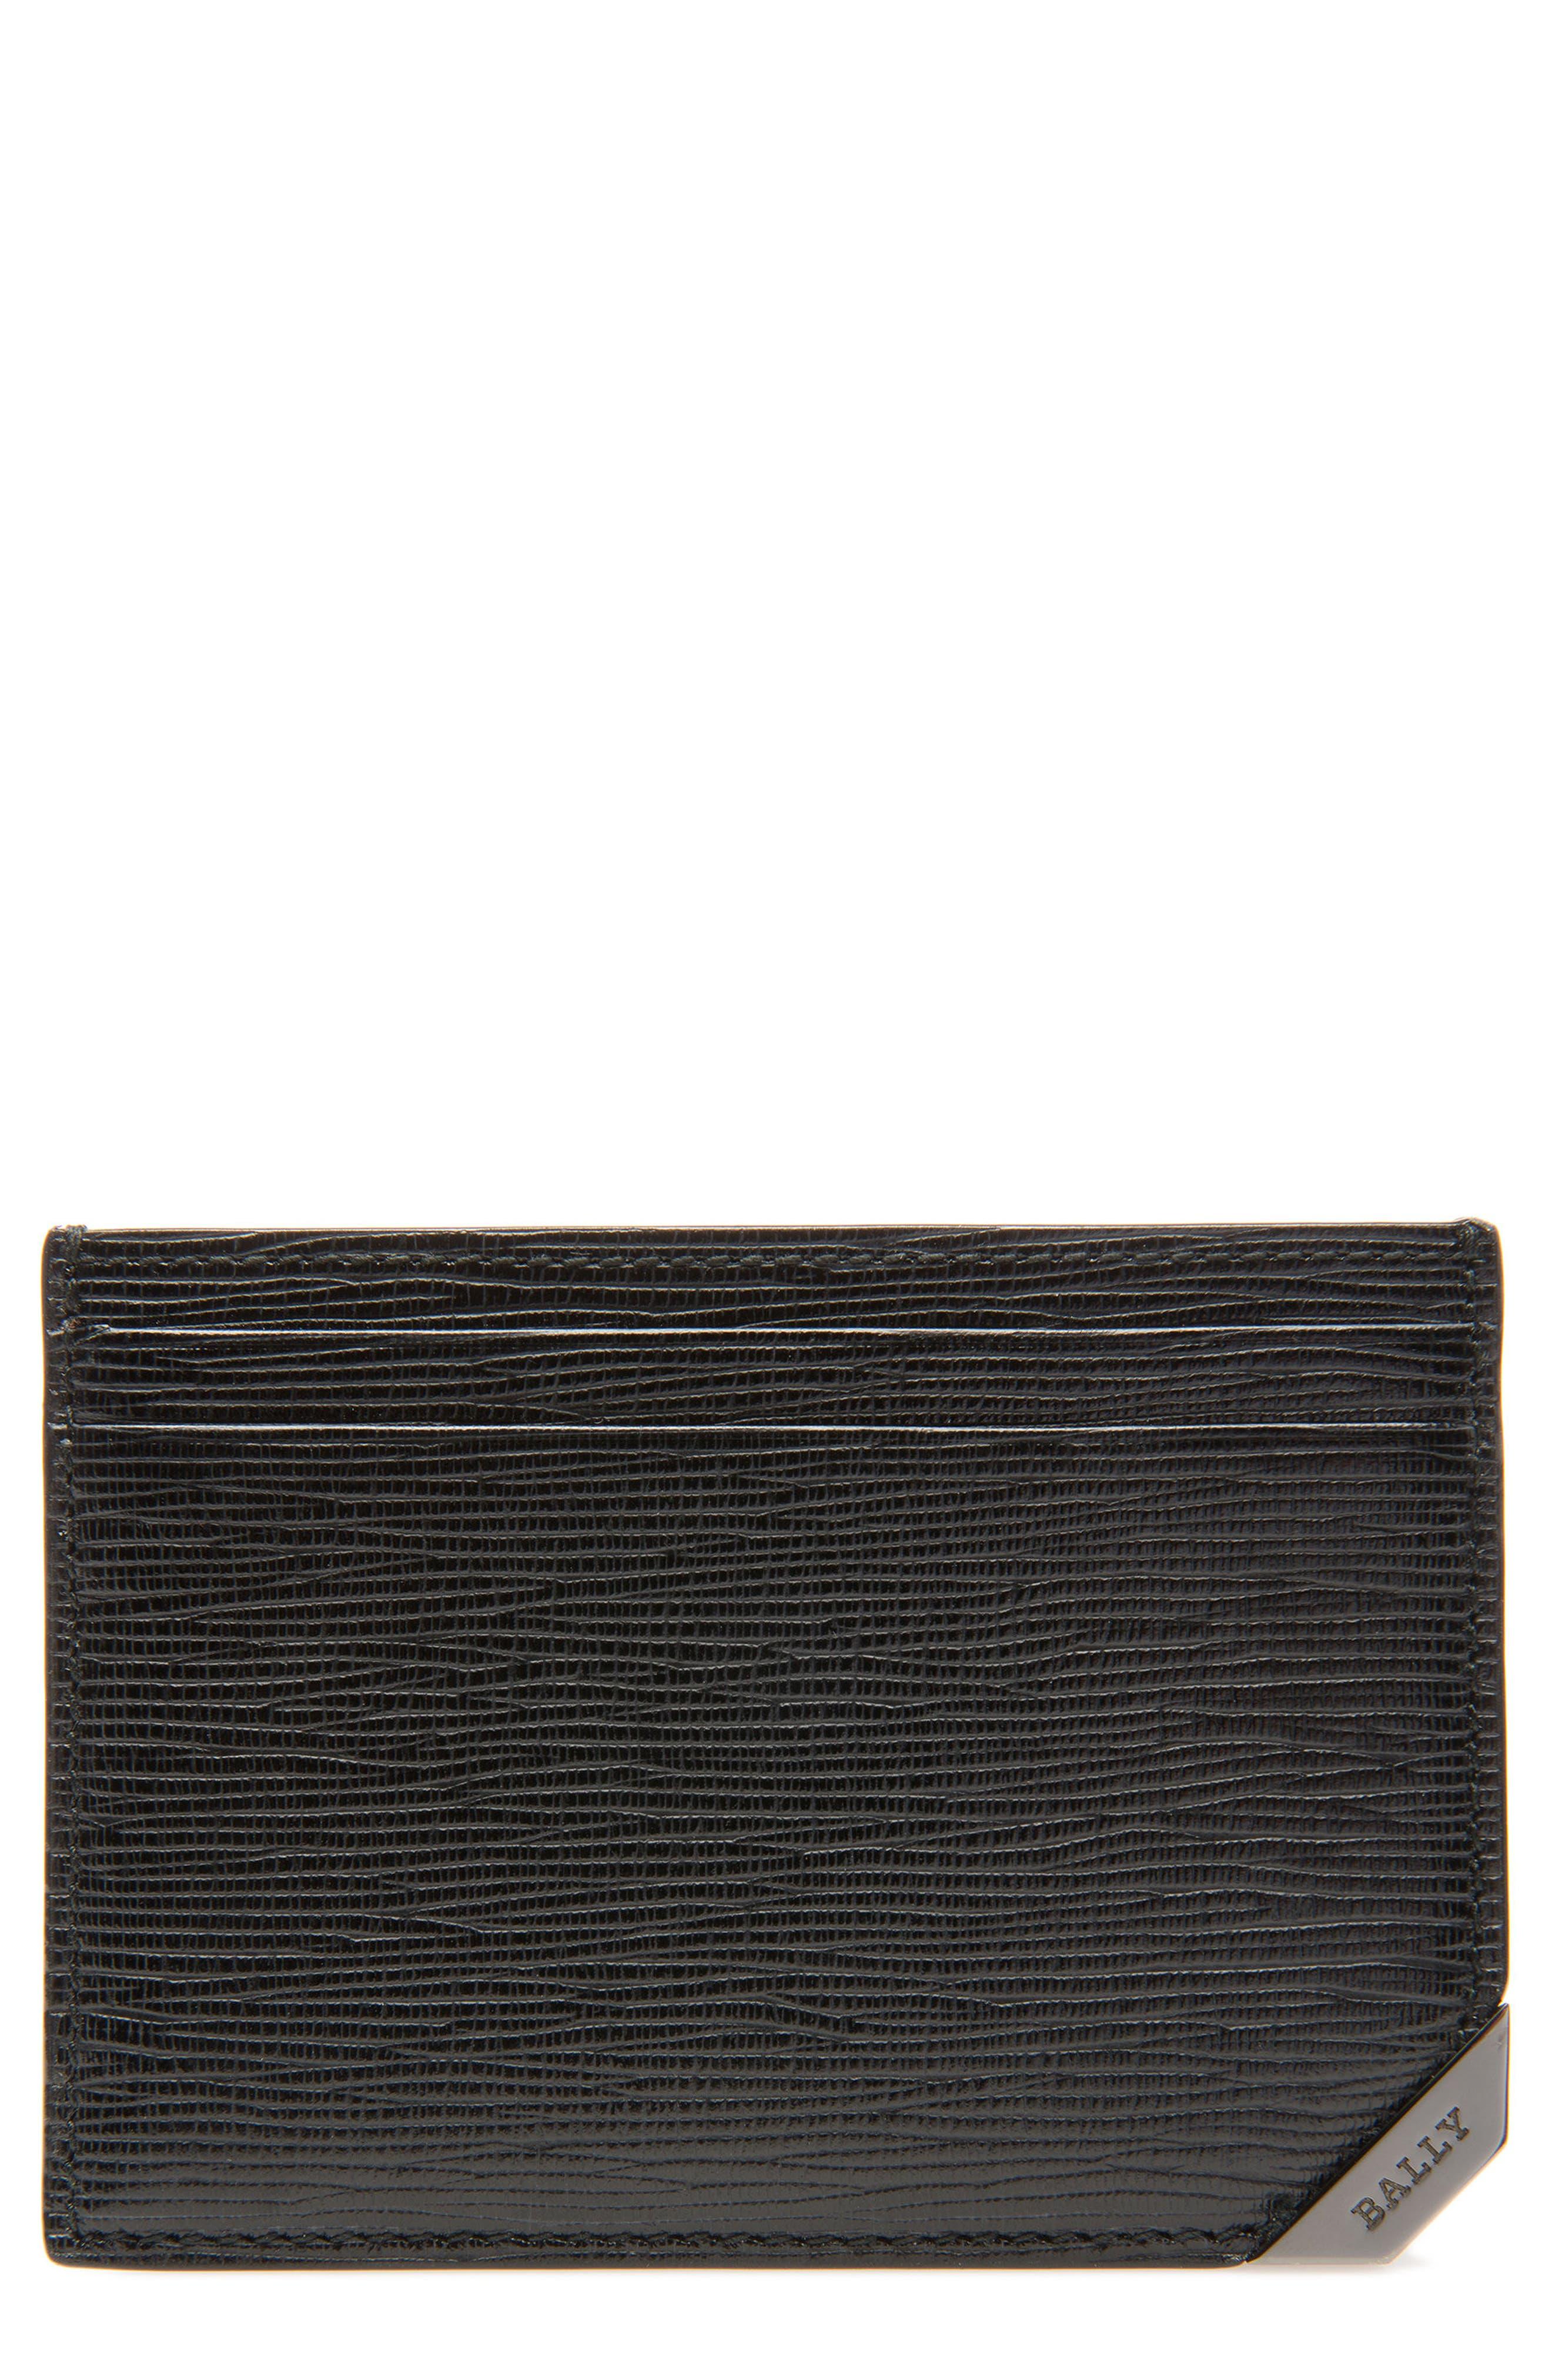 Bhar Leather Card Holder,                         Main,                         color,